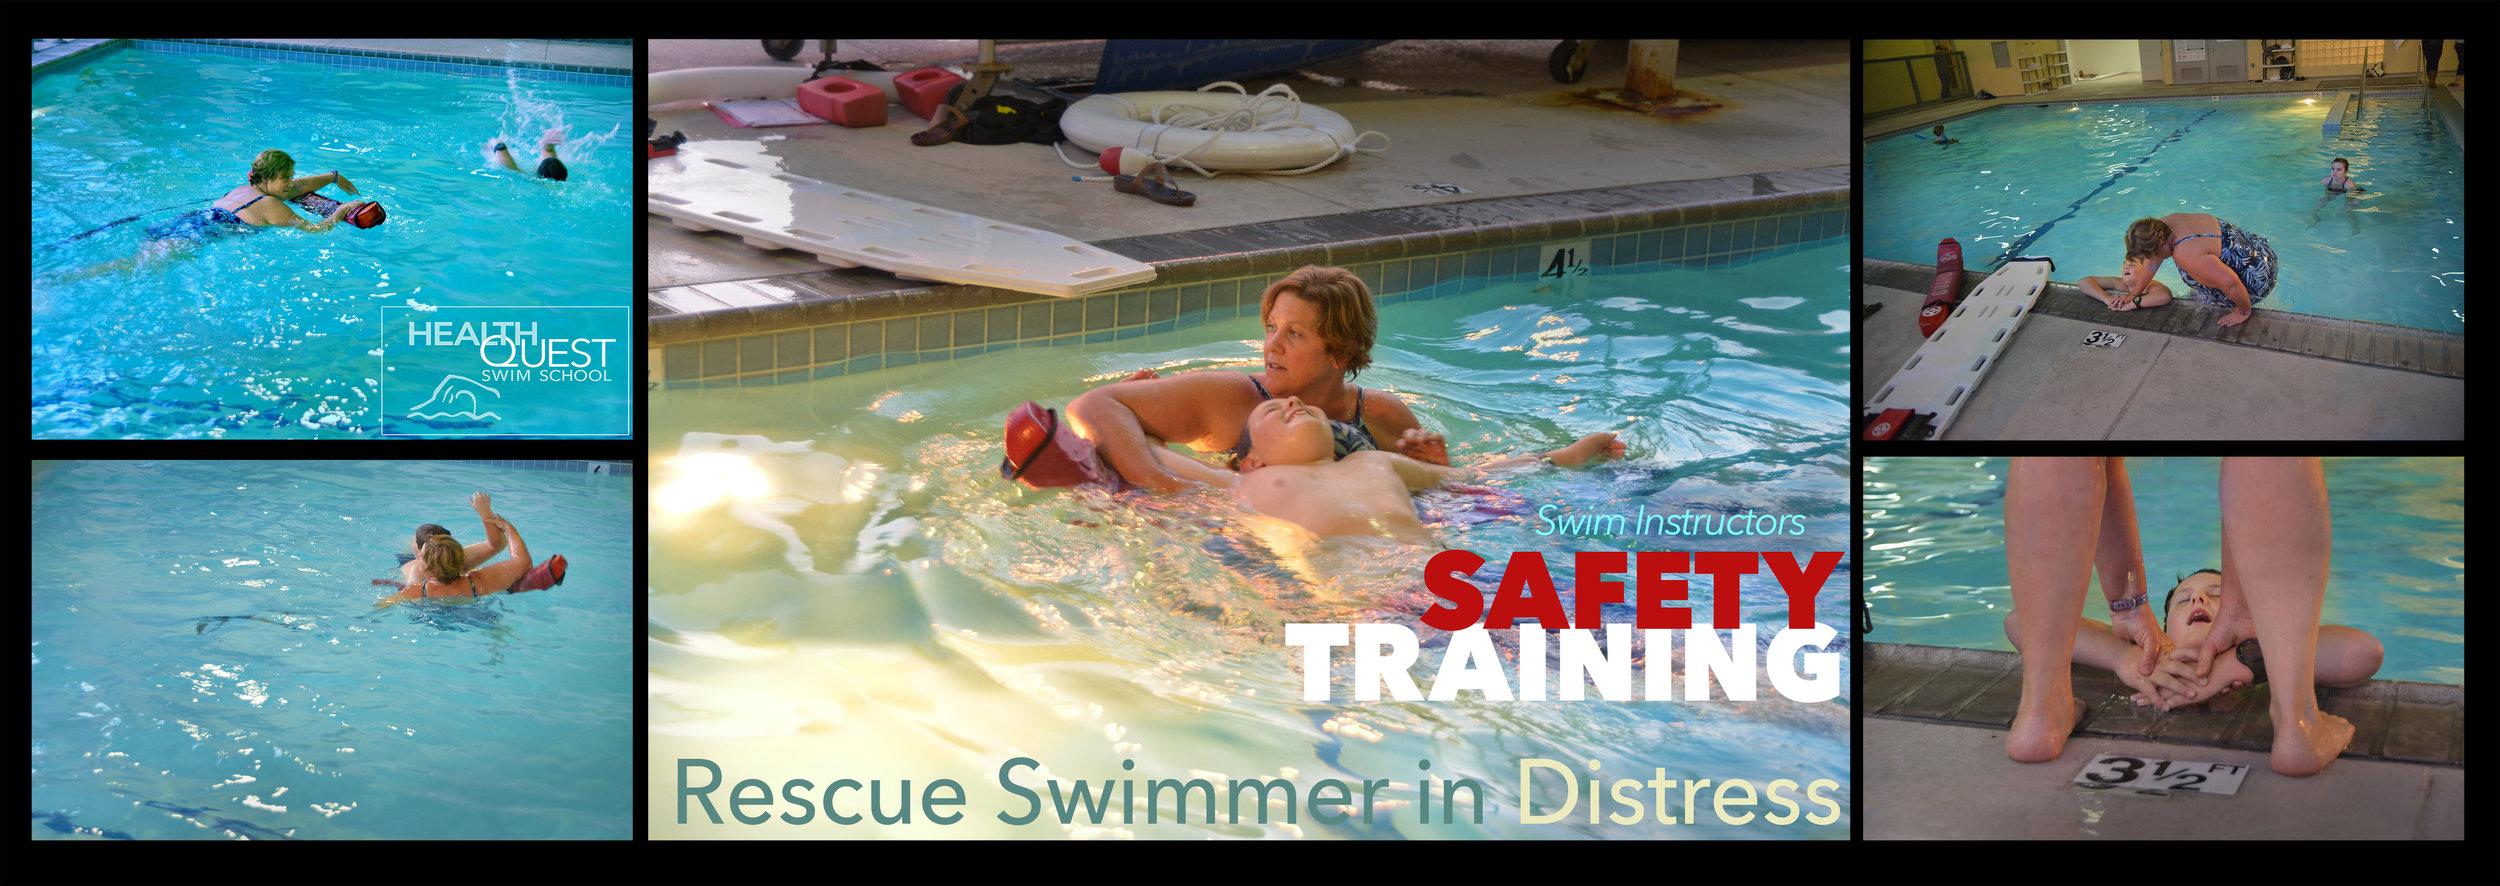 swim safety training3.jpg